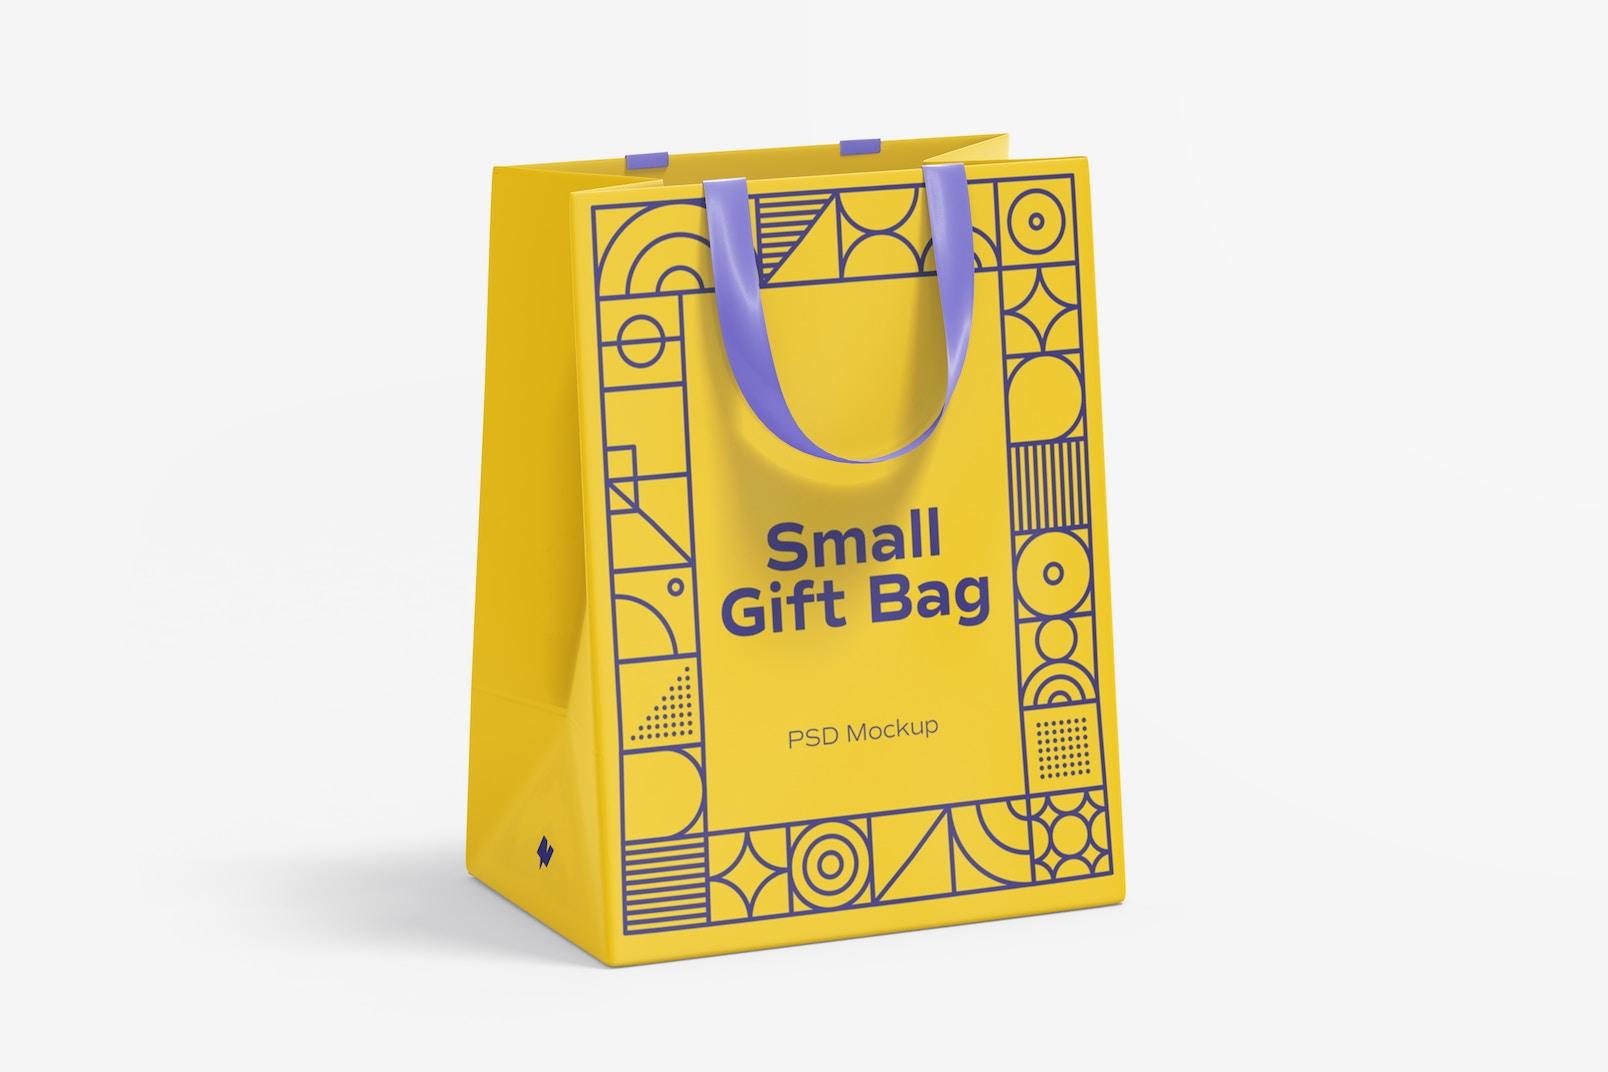 Small Gift Bag with Ribbon Handle Mockup, Front View